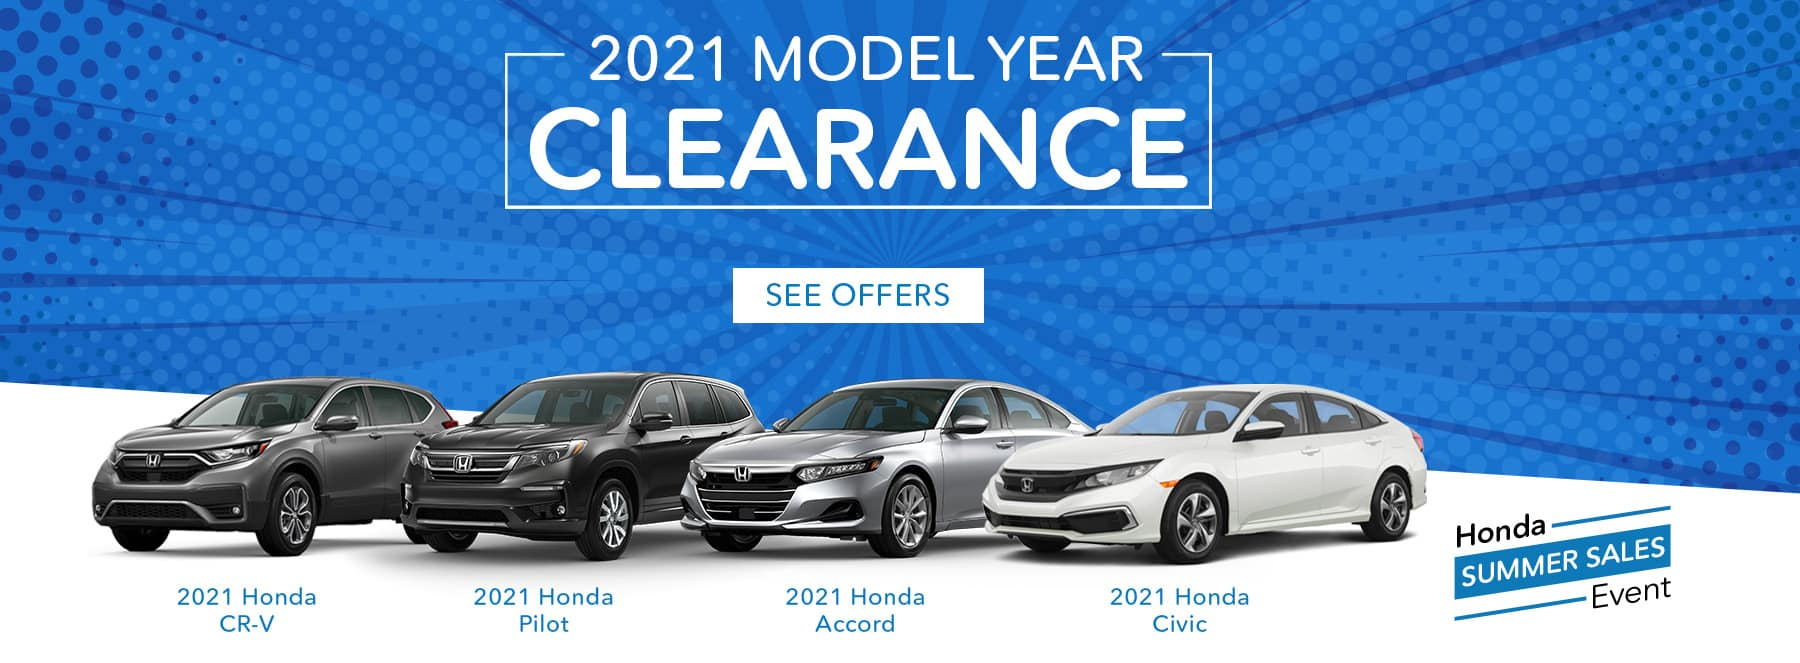 2021 Honda Model Year Clearance